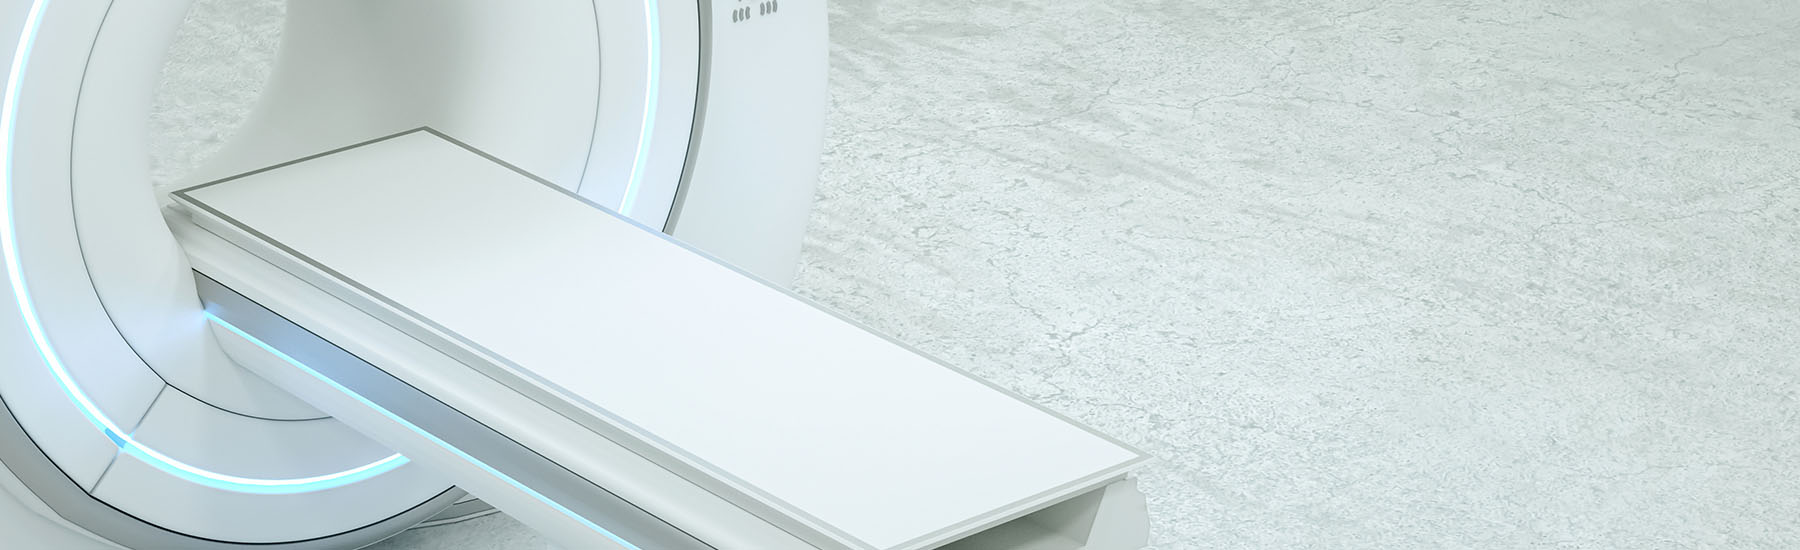 Best Radiology Company